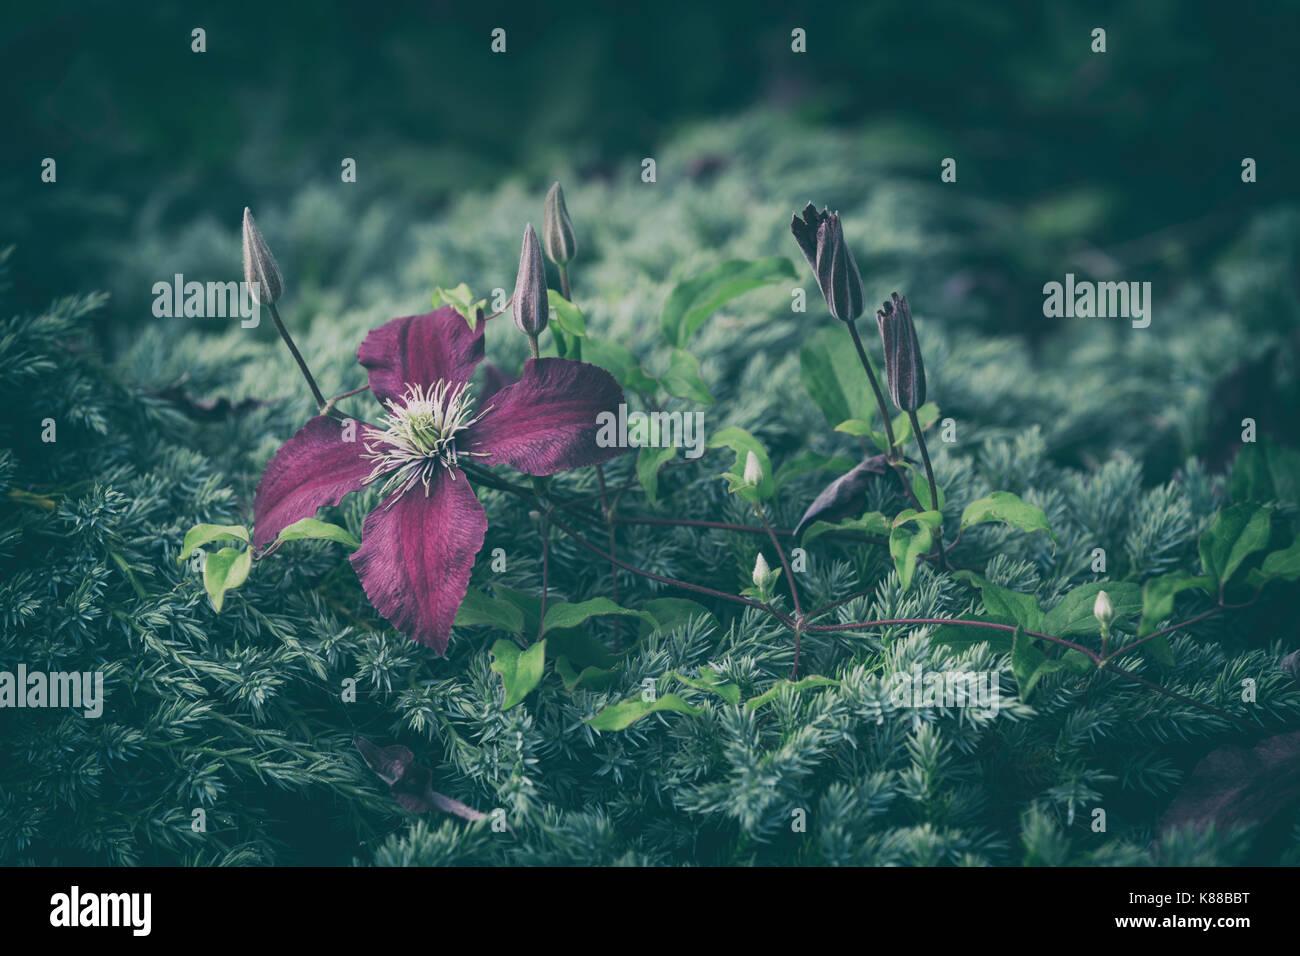 Purple Clematis flower. - Stock Image